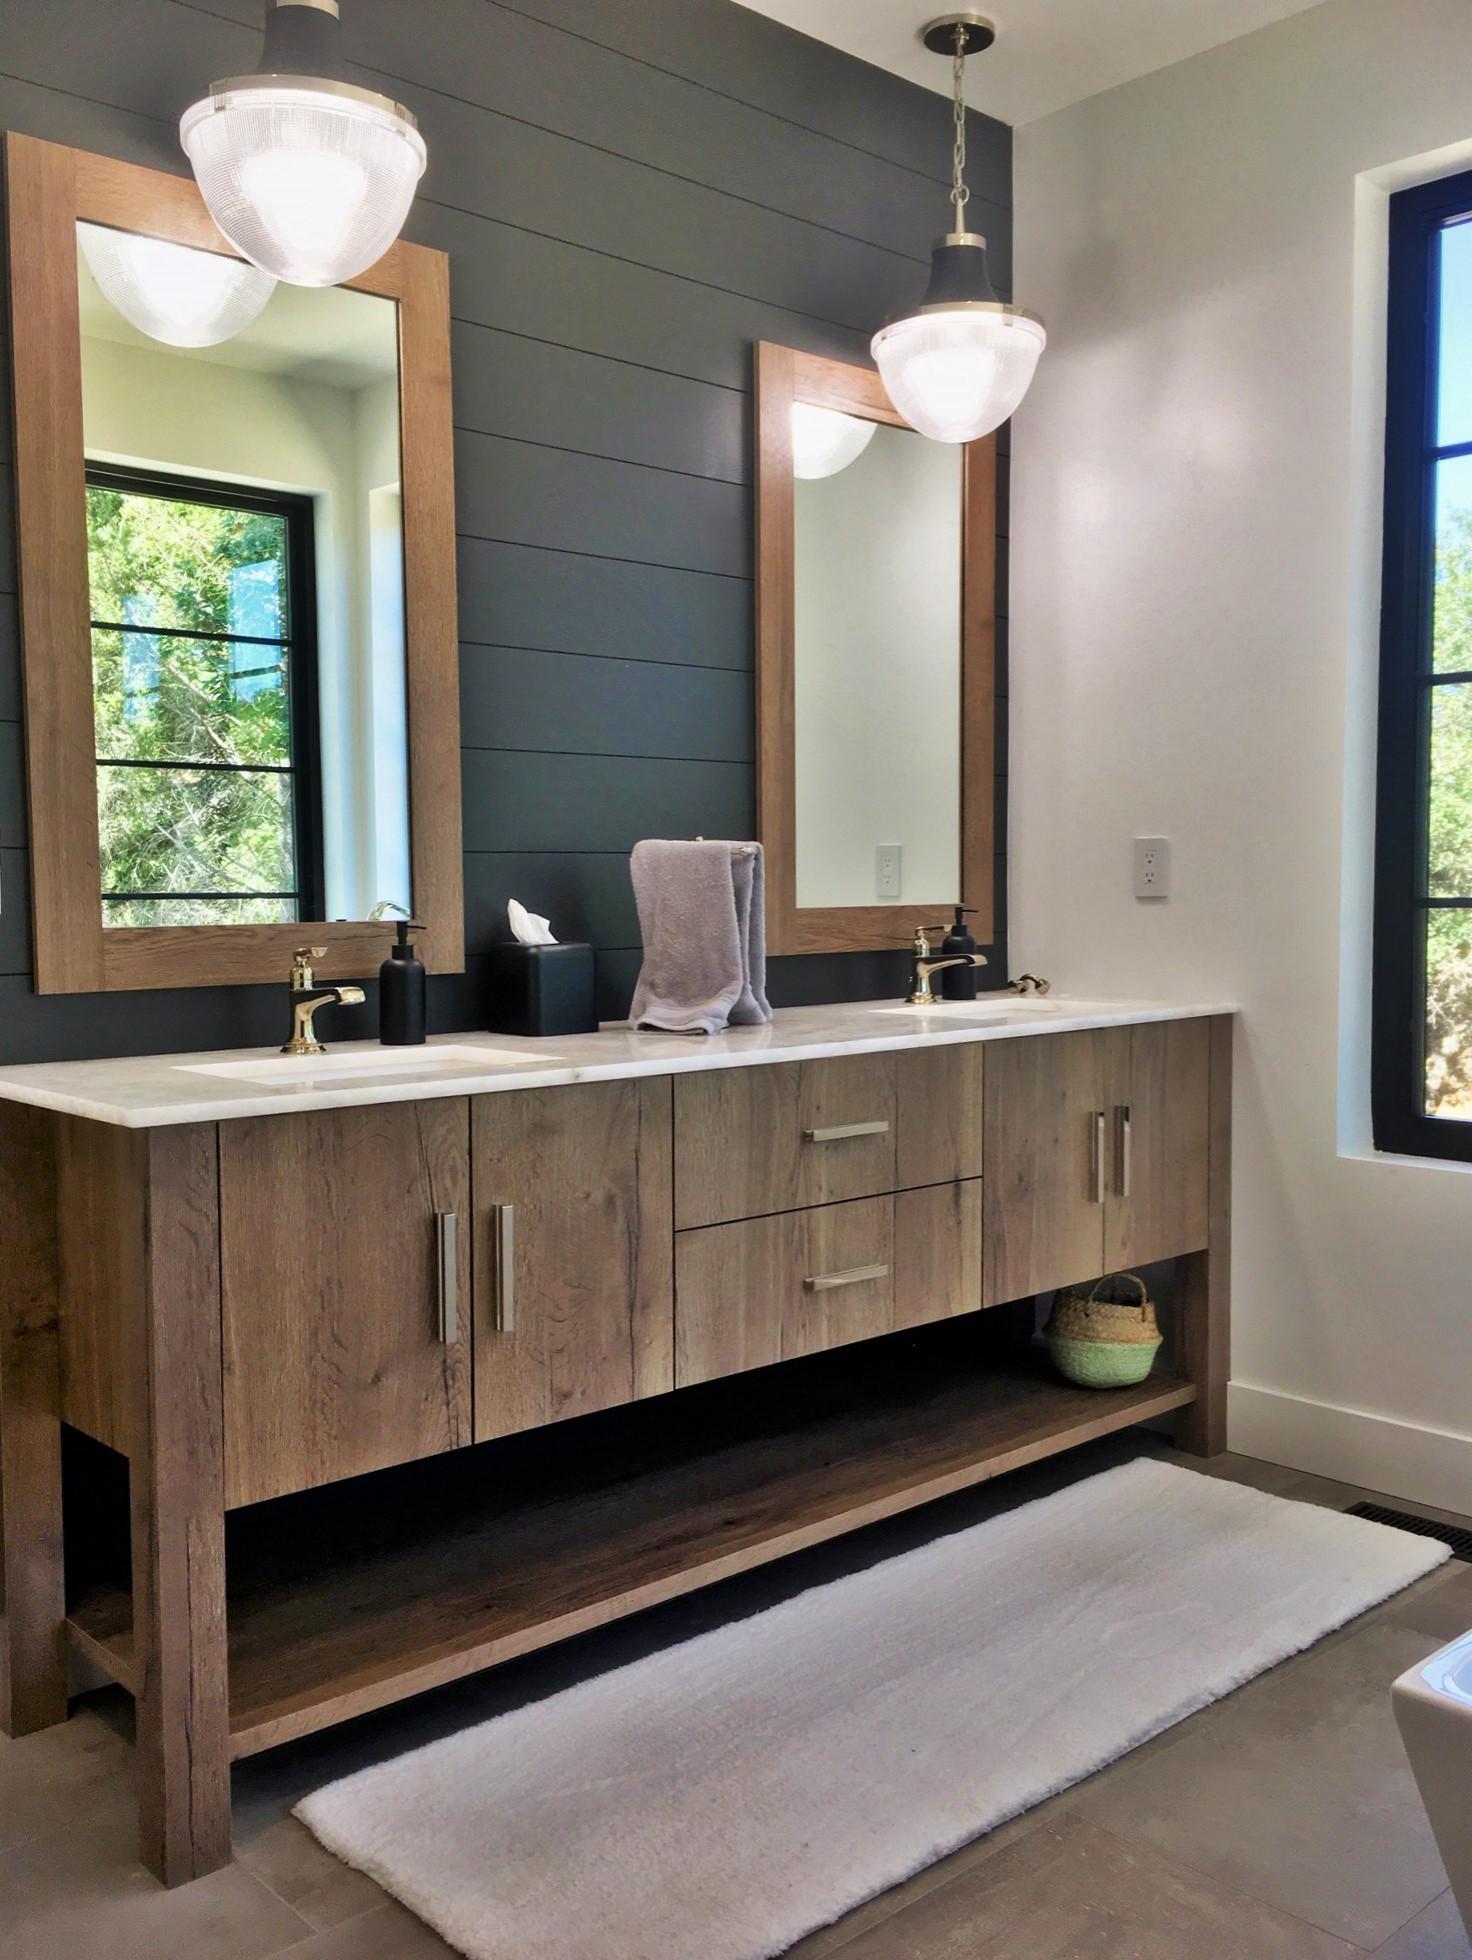 Modern Sonoma Bath - New Home on a Hill